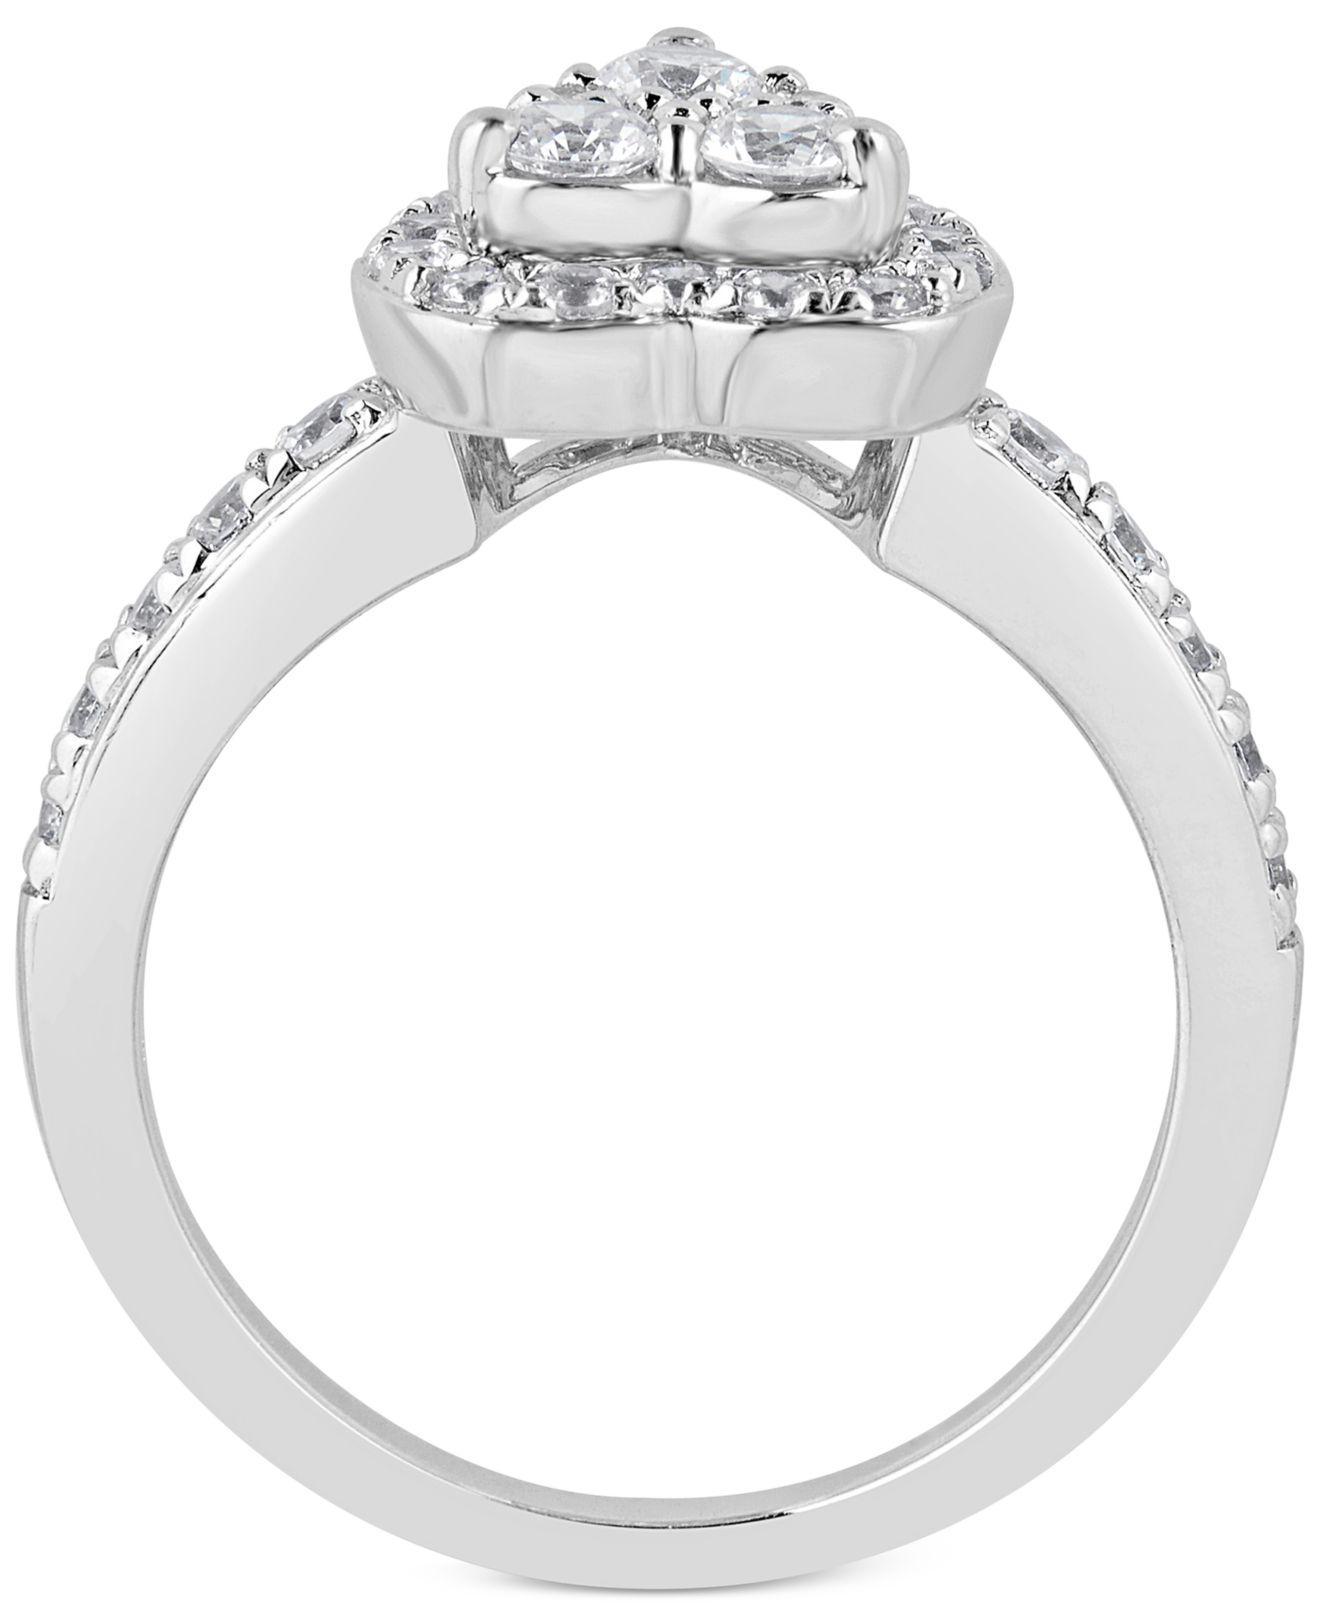 Macy s Diamond Heart Halo Bridal Set 1 1 4 Ct T w In 14k White